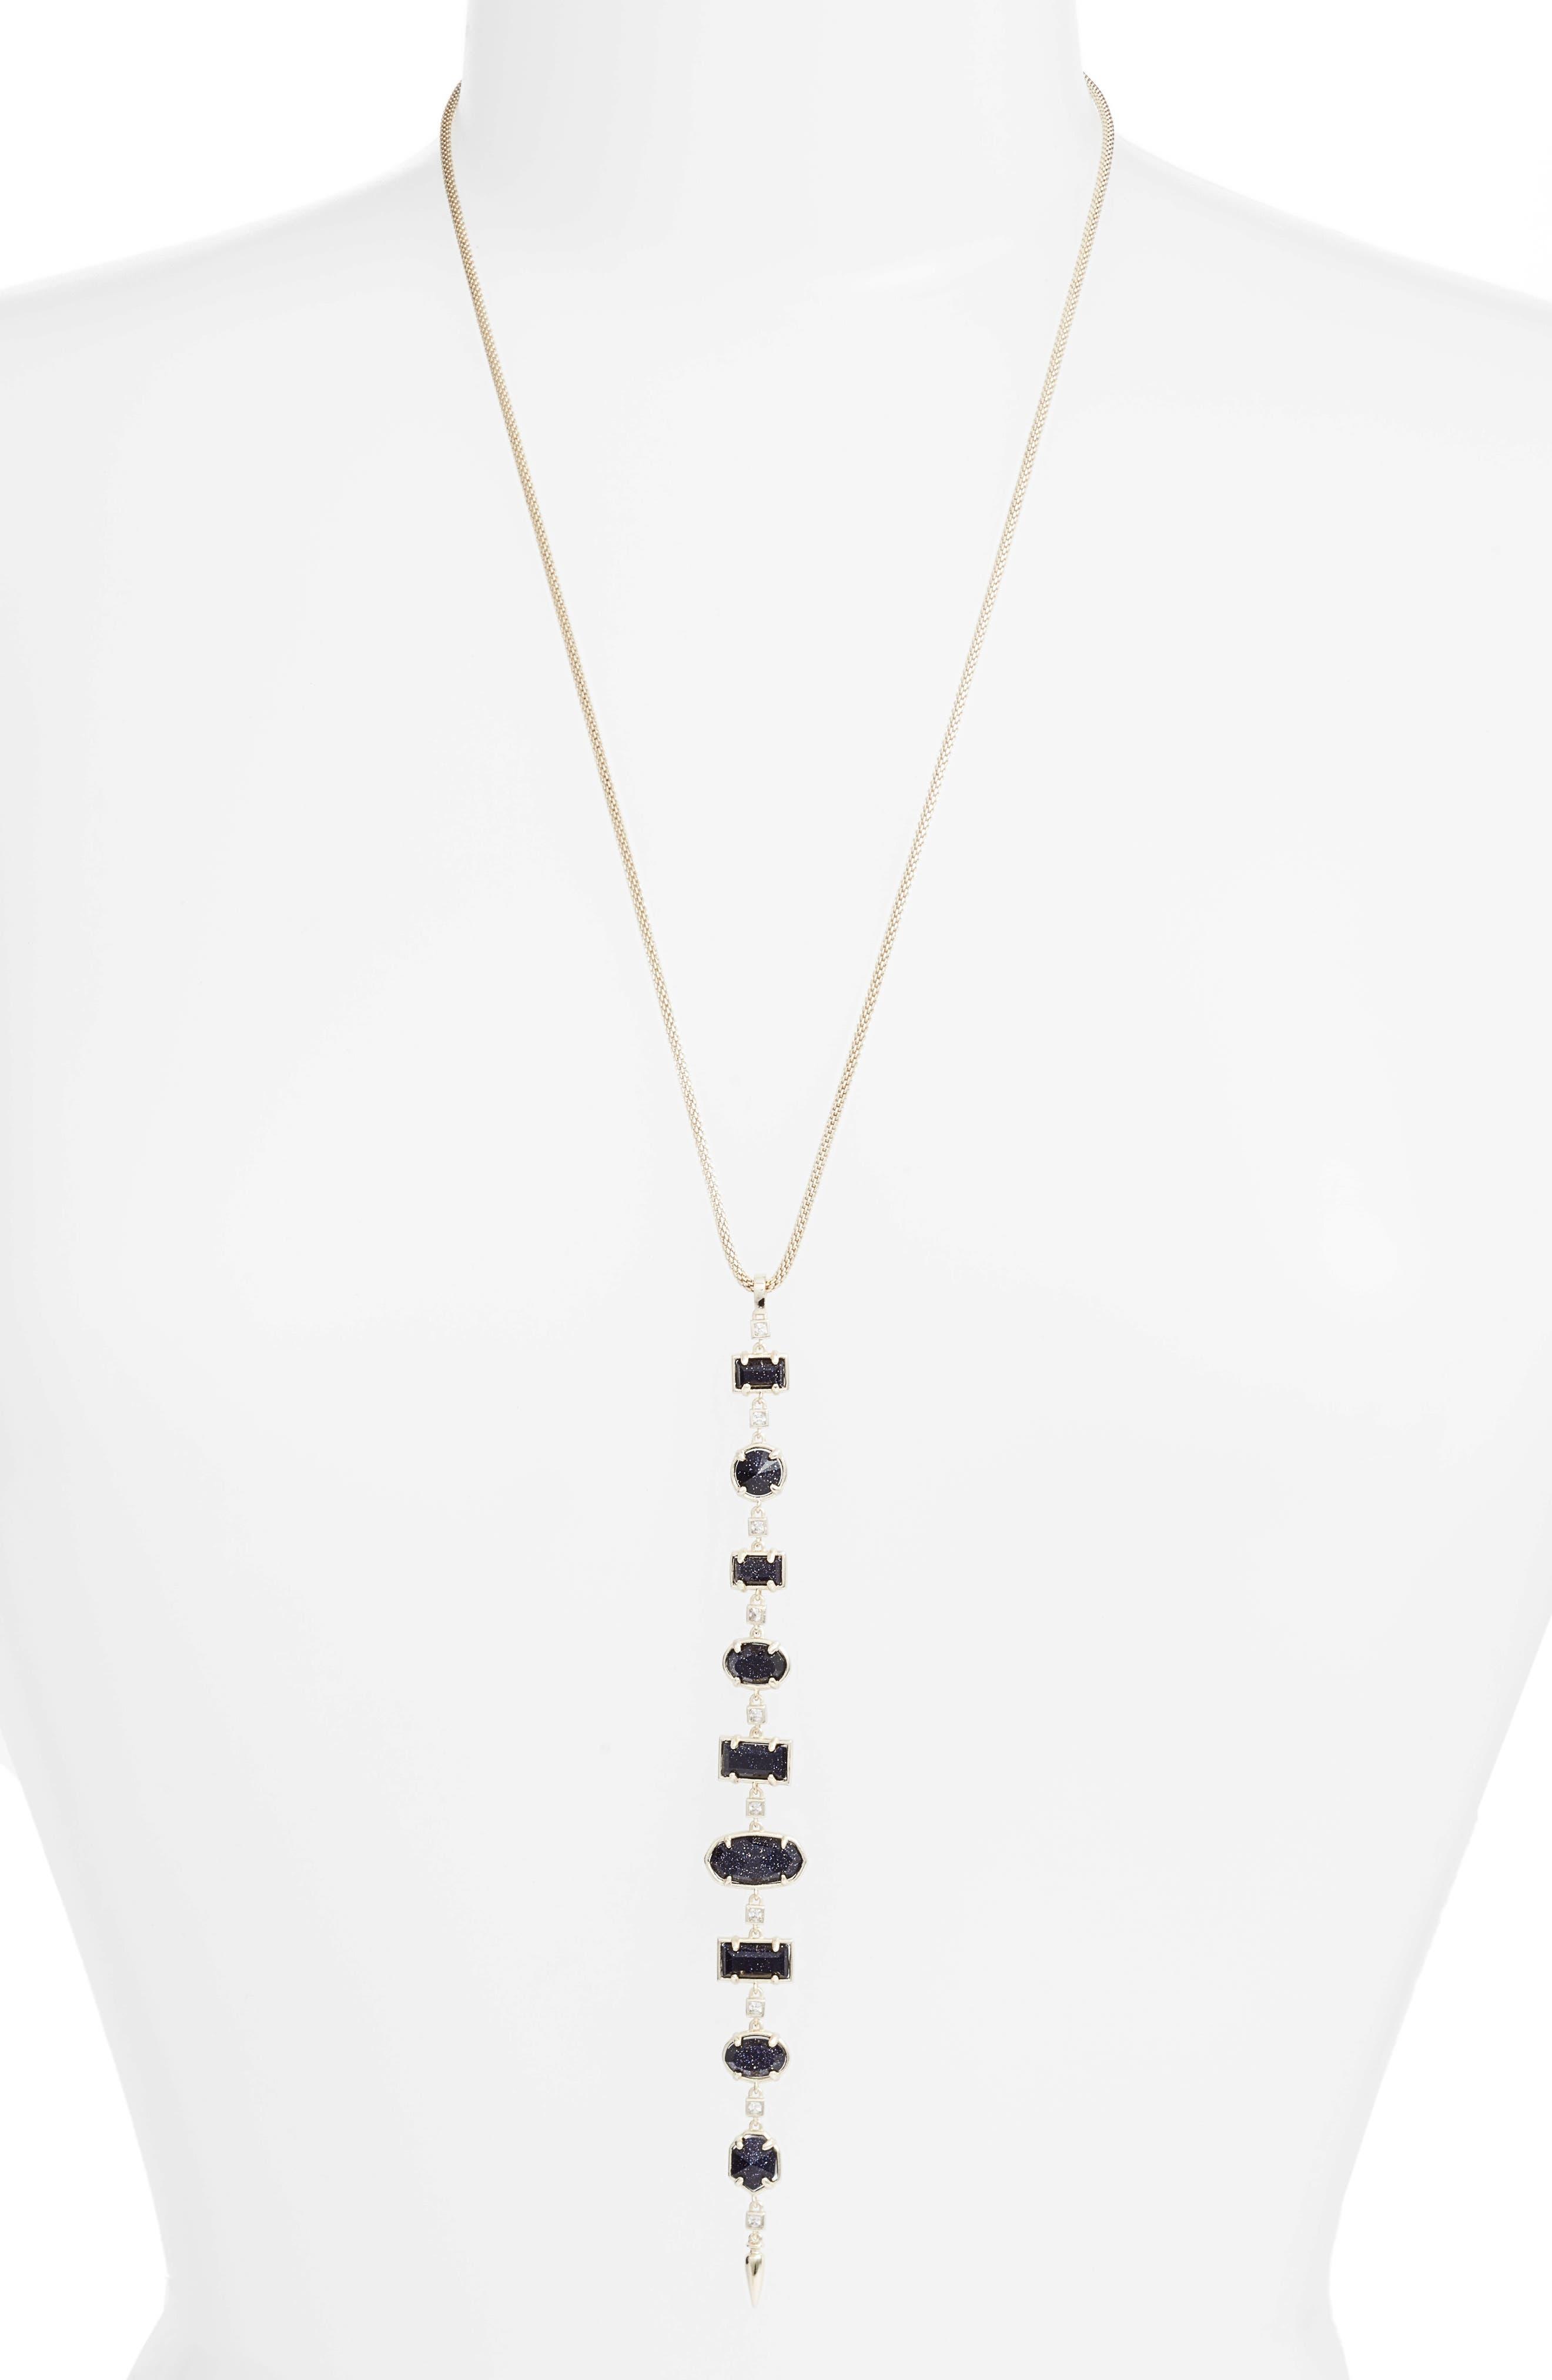 Kendra Scott Braxton Stone Drop Pendant Necklace (Nordstrom Exclusive)